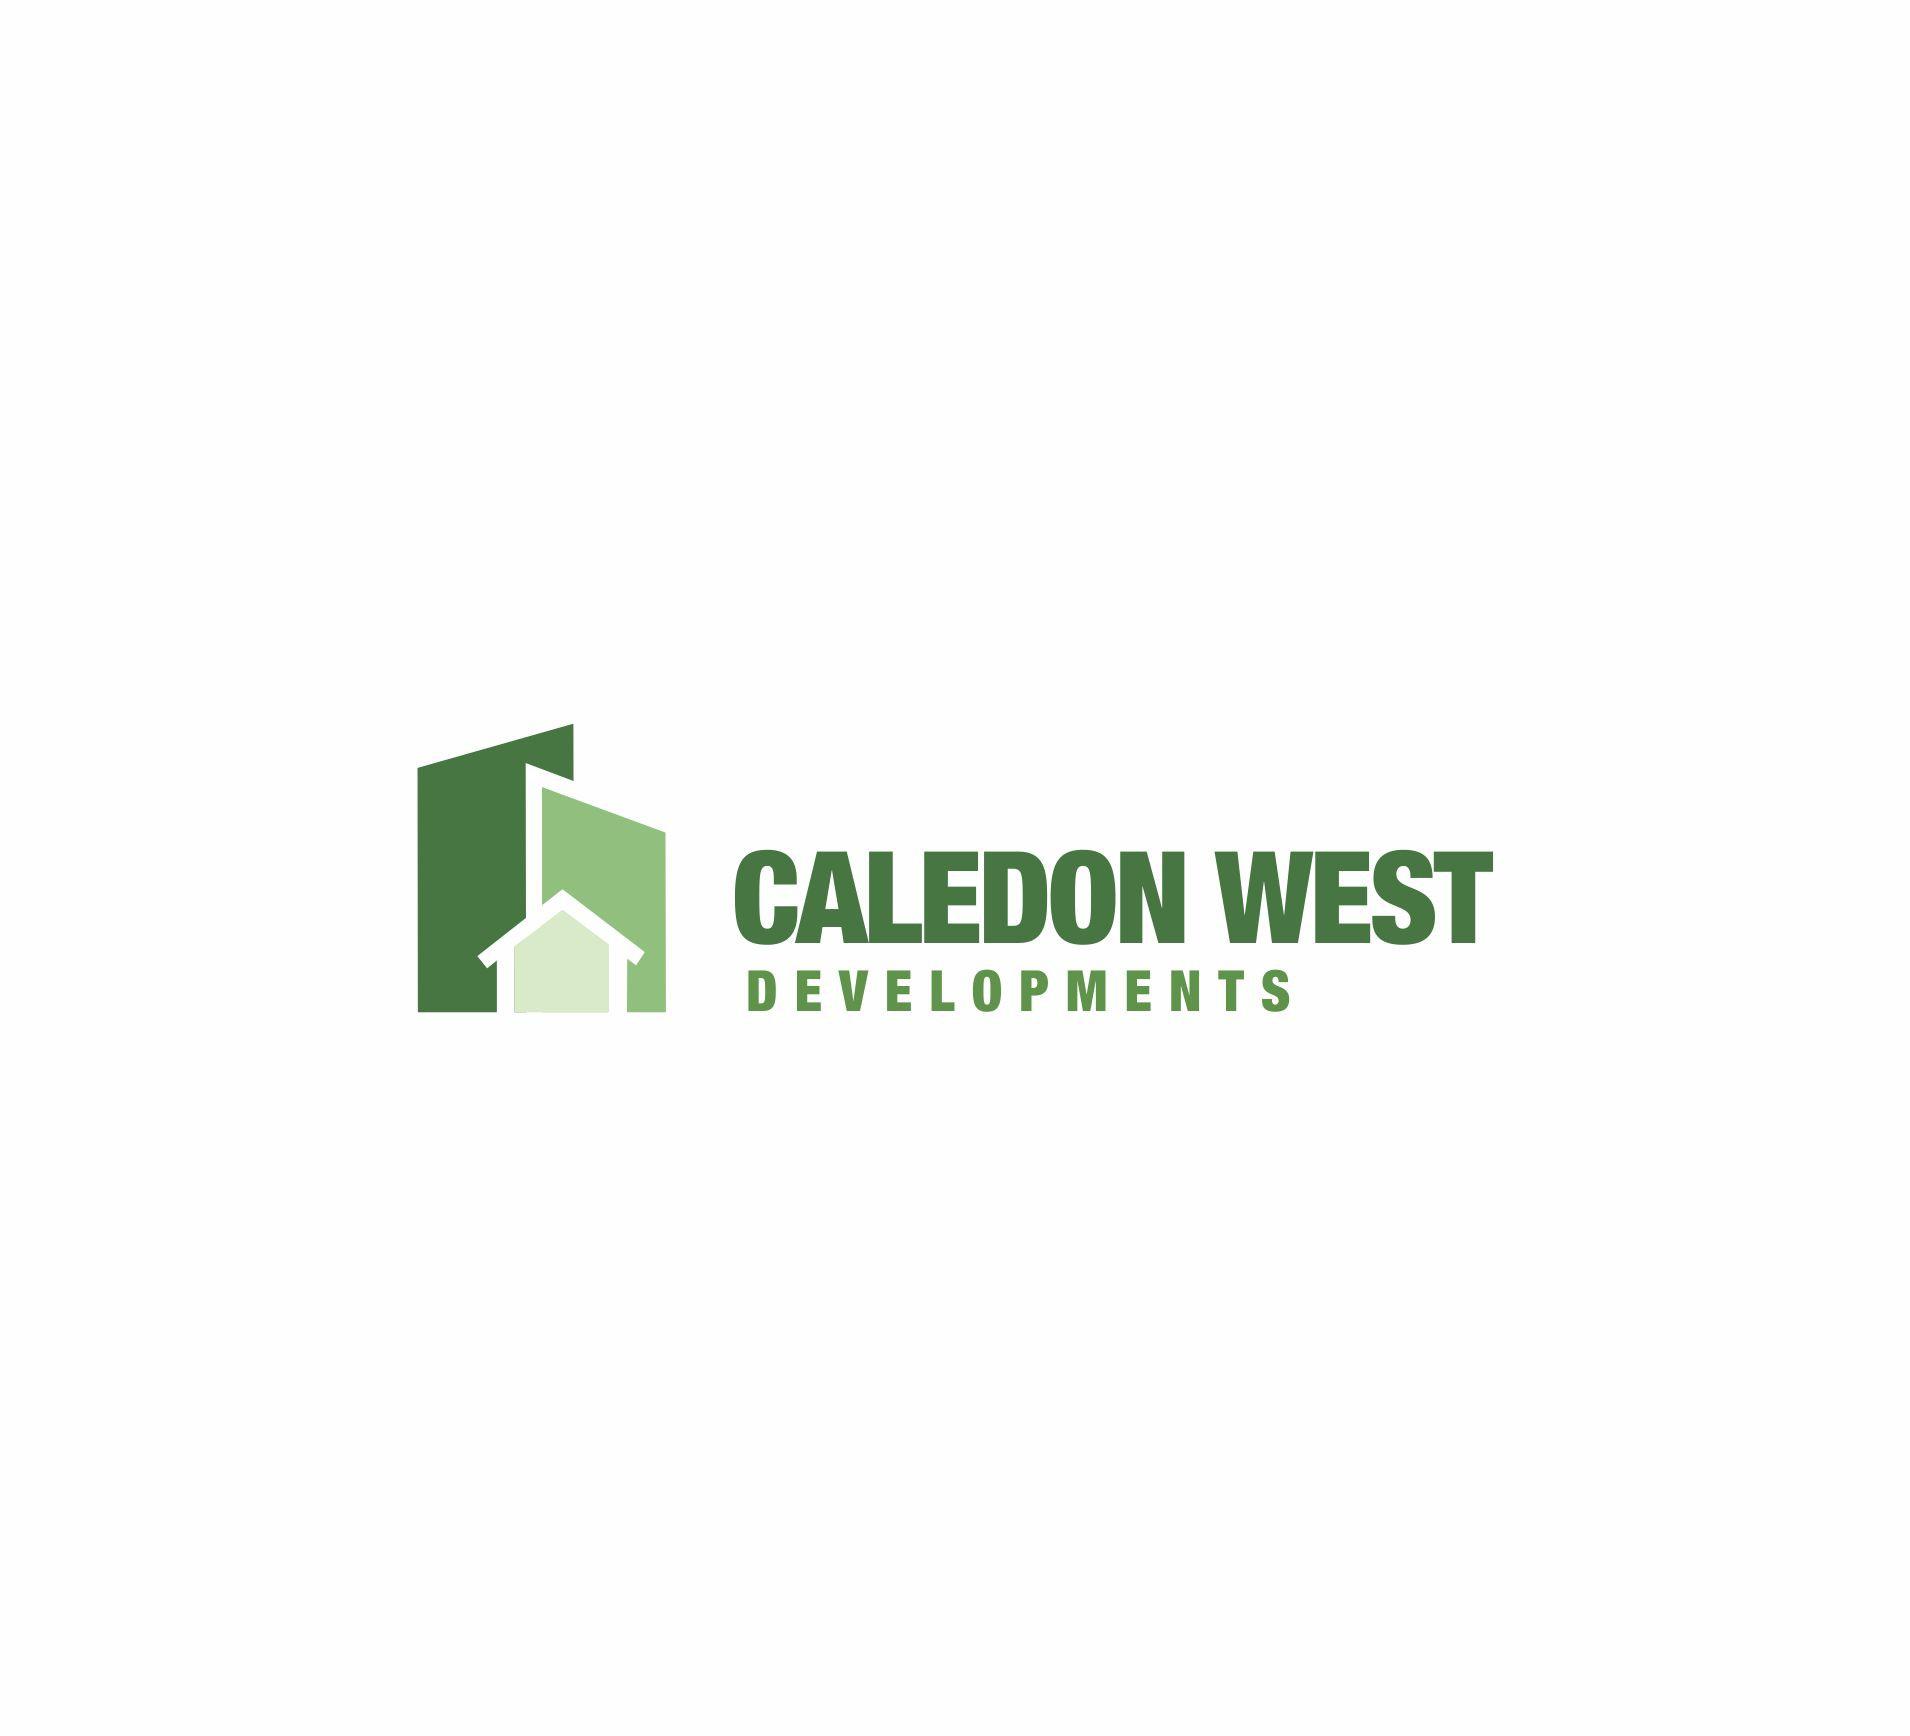 Caledon West Developments needs a new logo